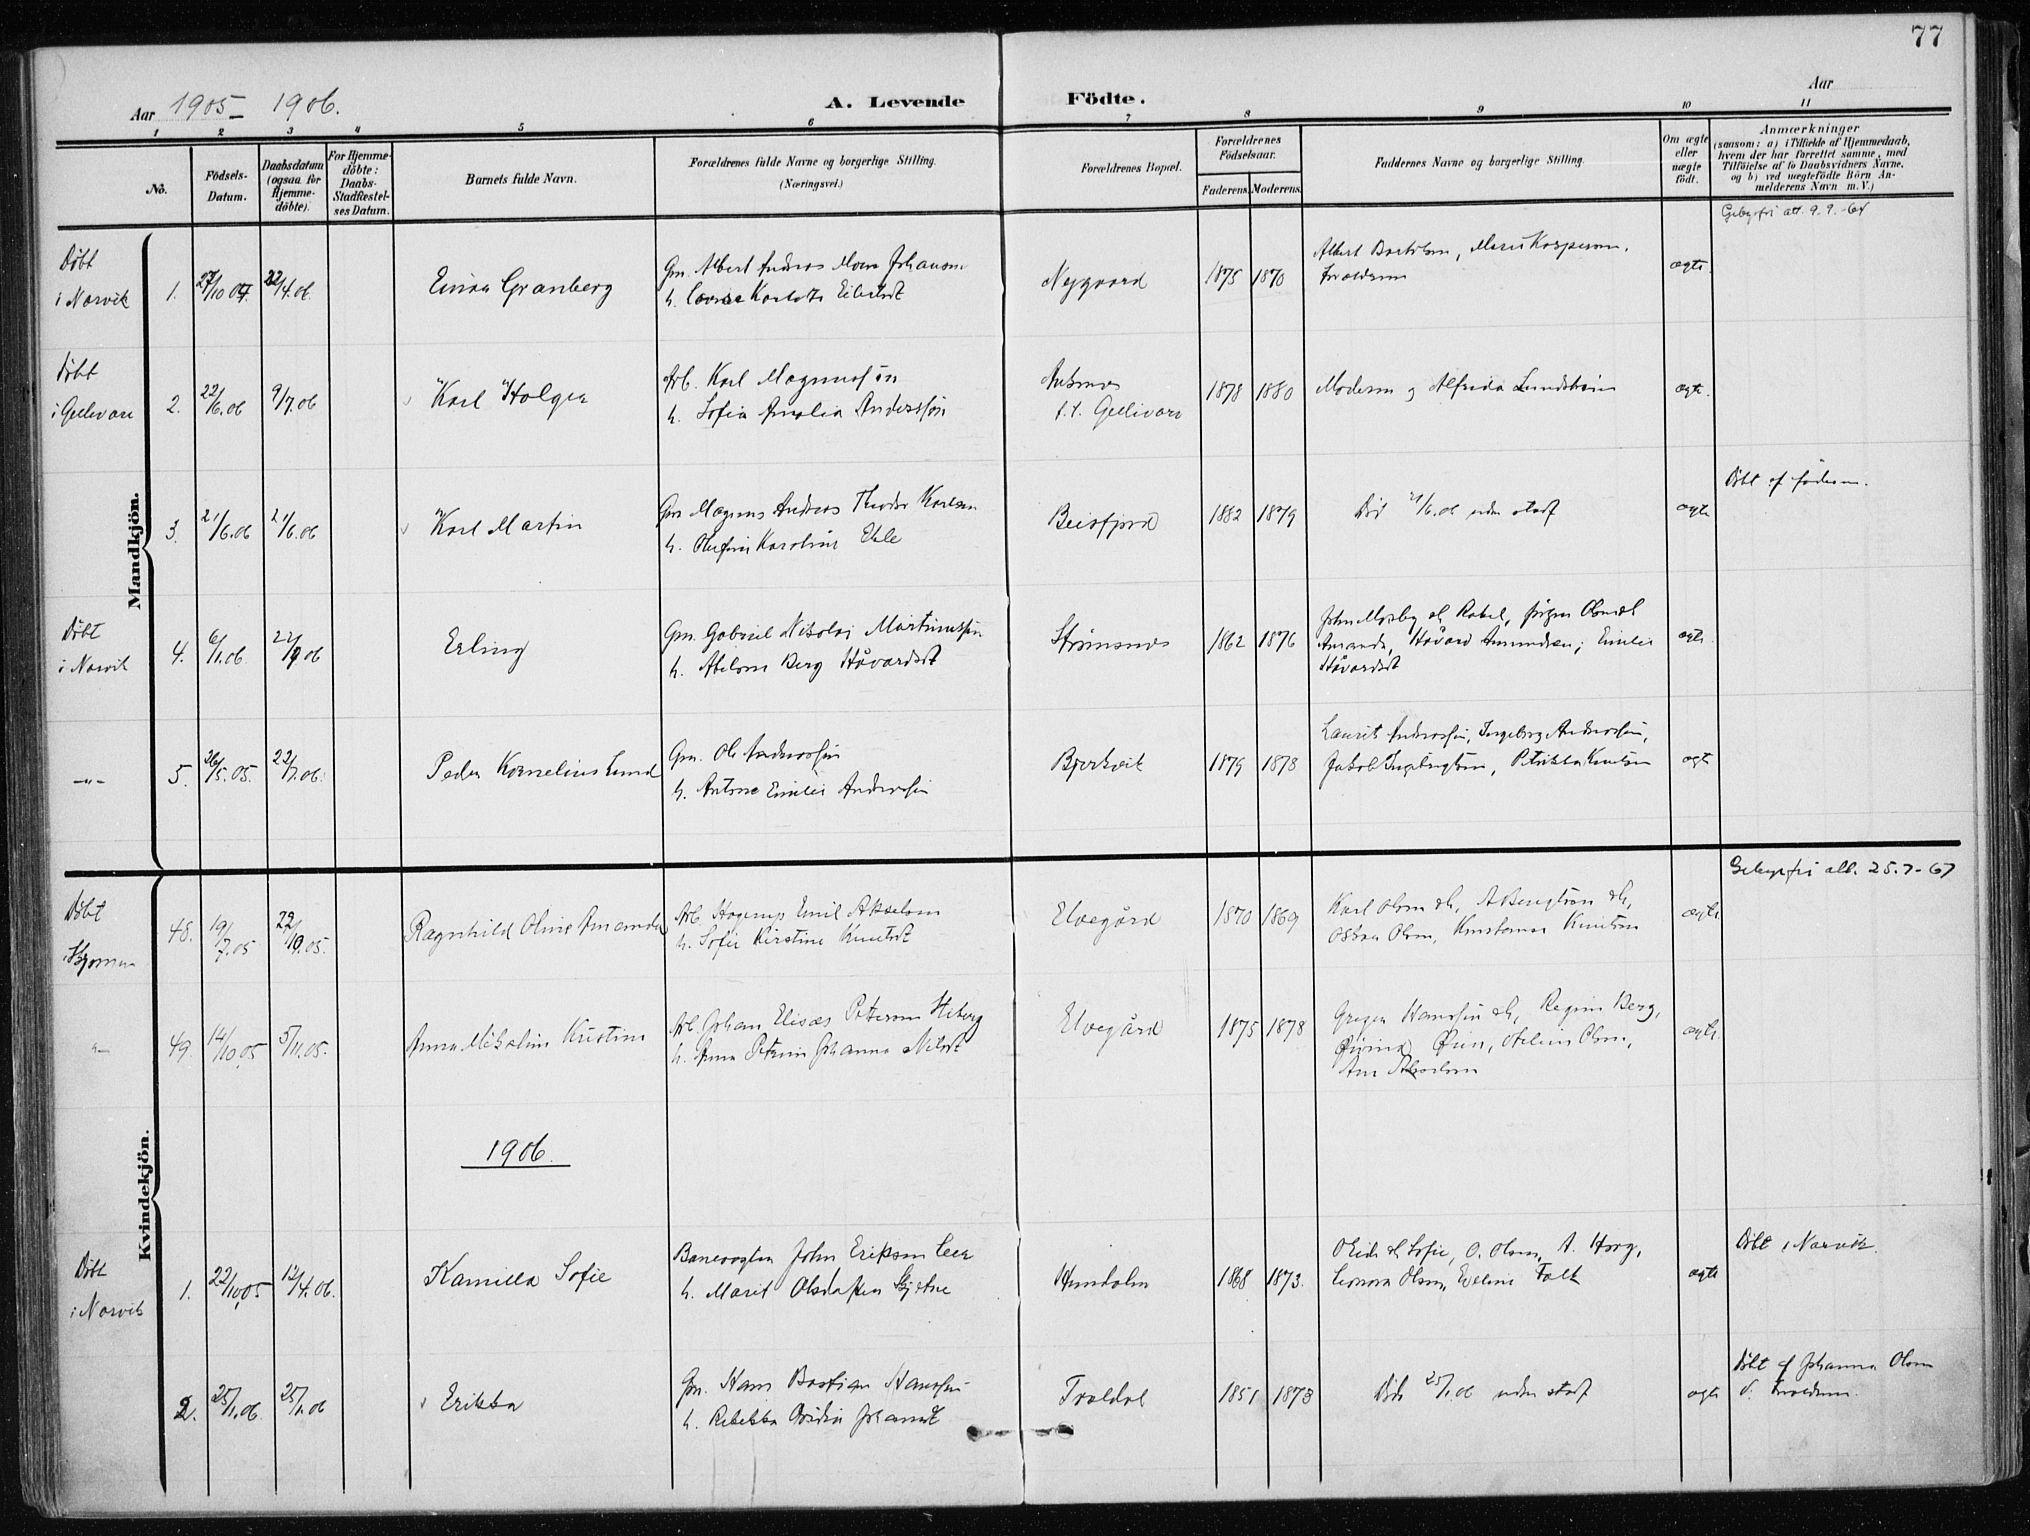 SAT, Ministerialprotokoller, klokkerbøker og fødselsregistre - Nordland, 866/L0941: Ministerialbok nr. 866A04, 1901-1917, s. 77